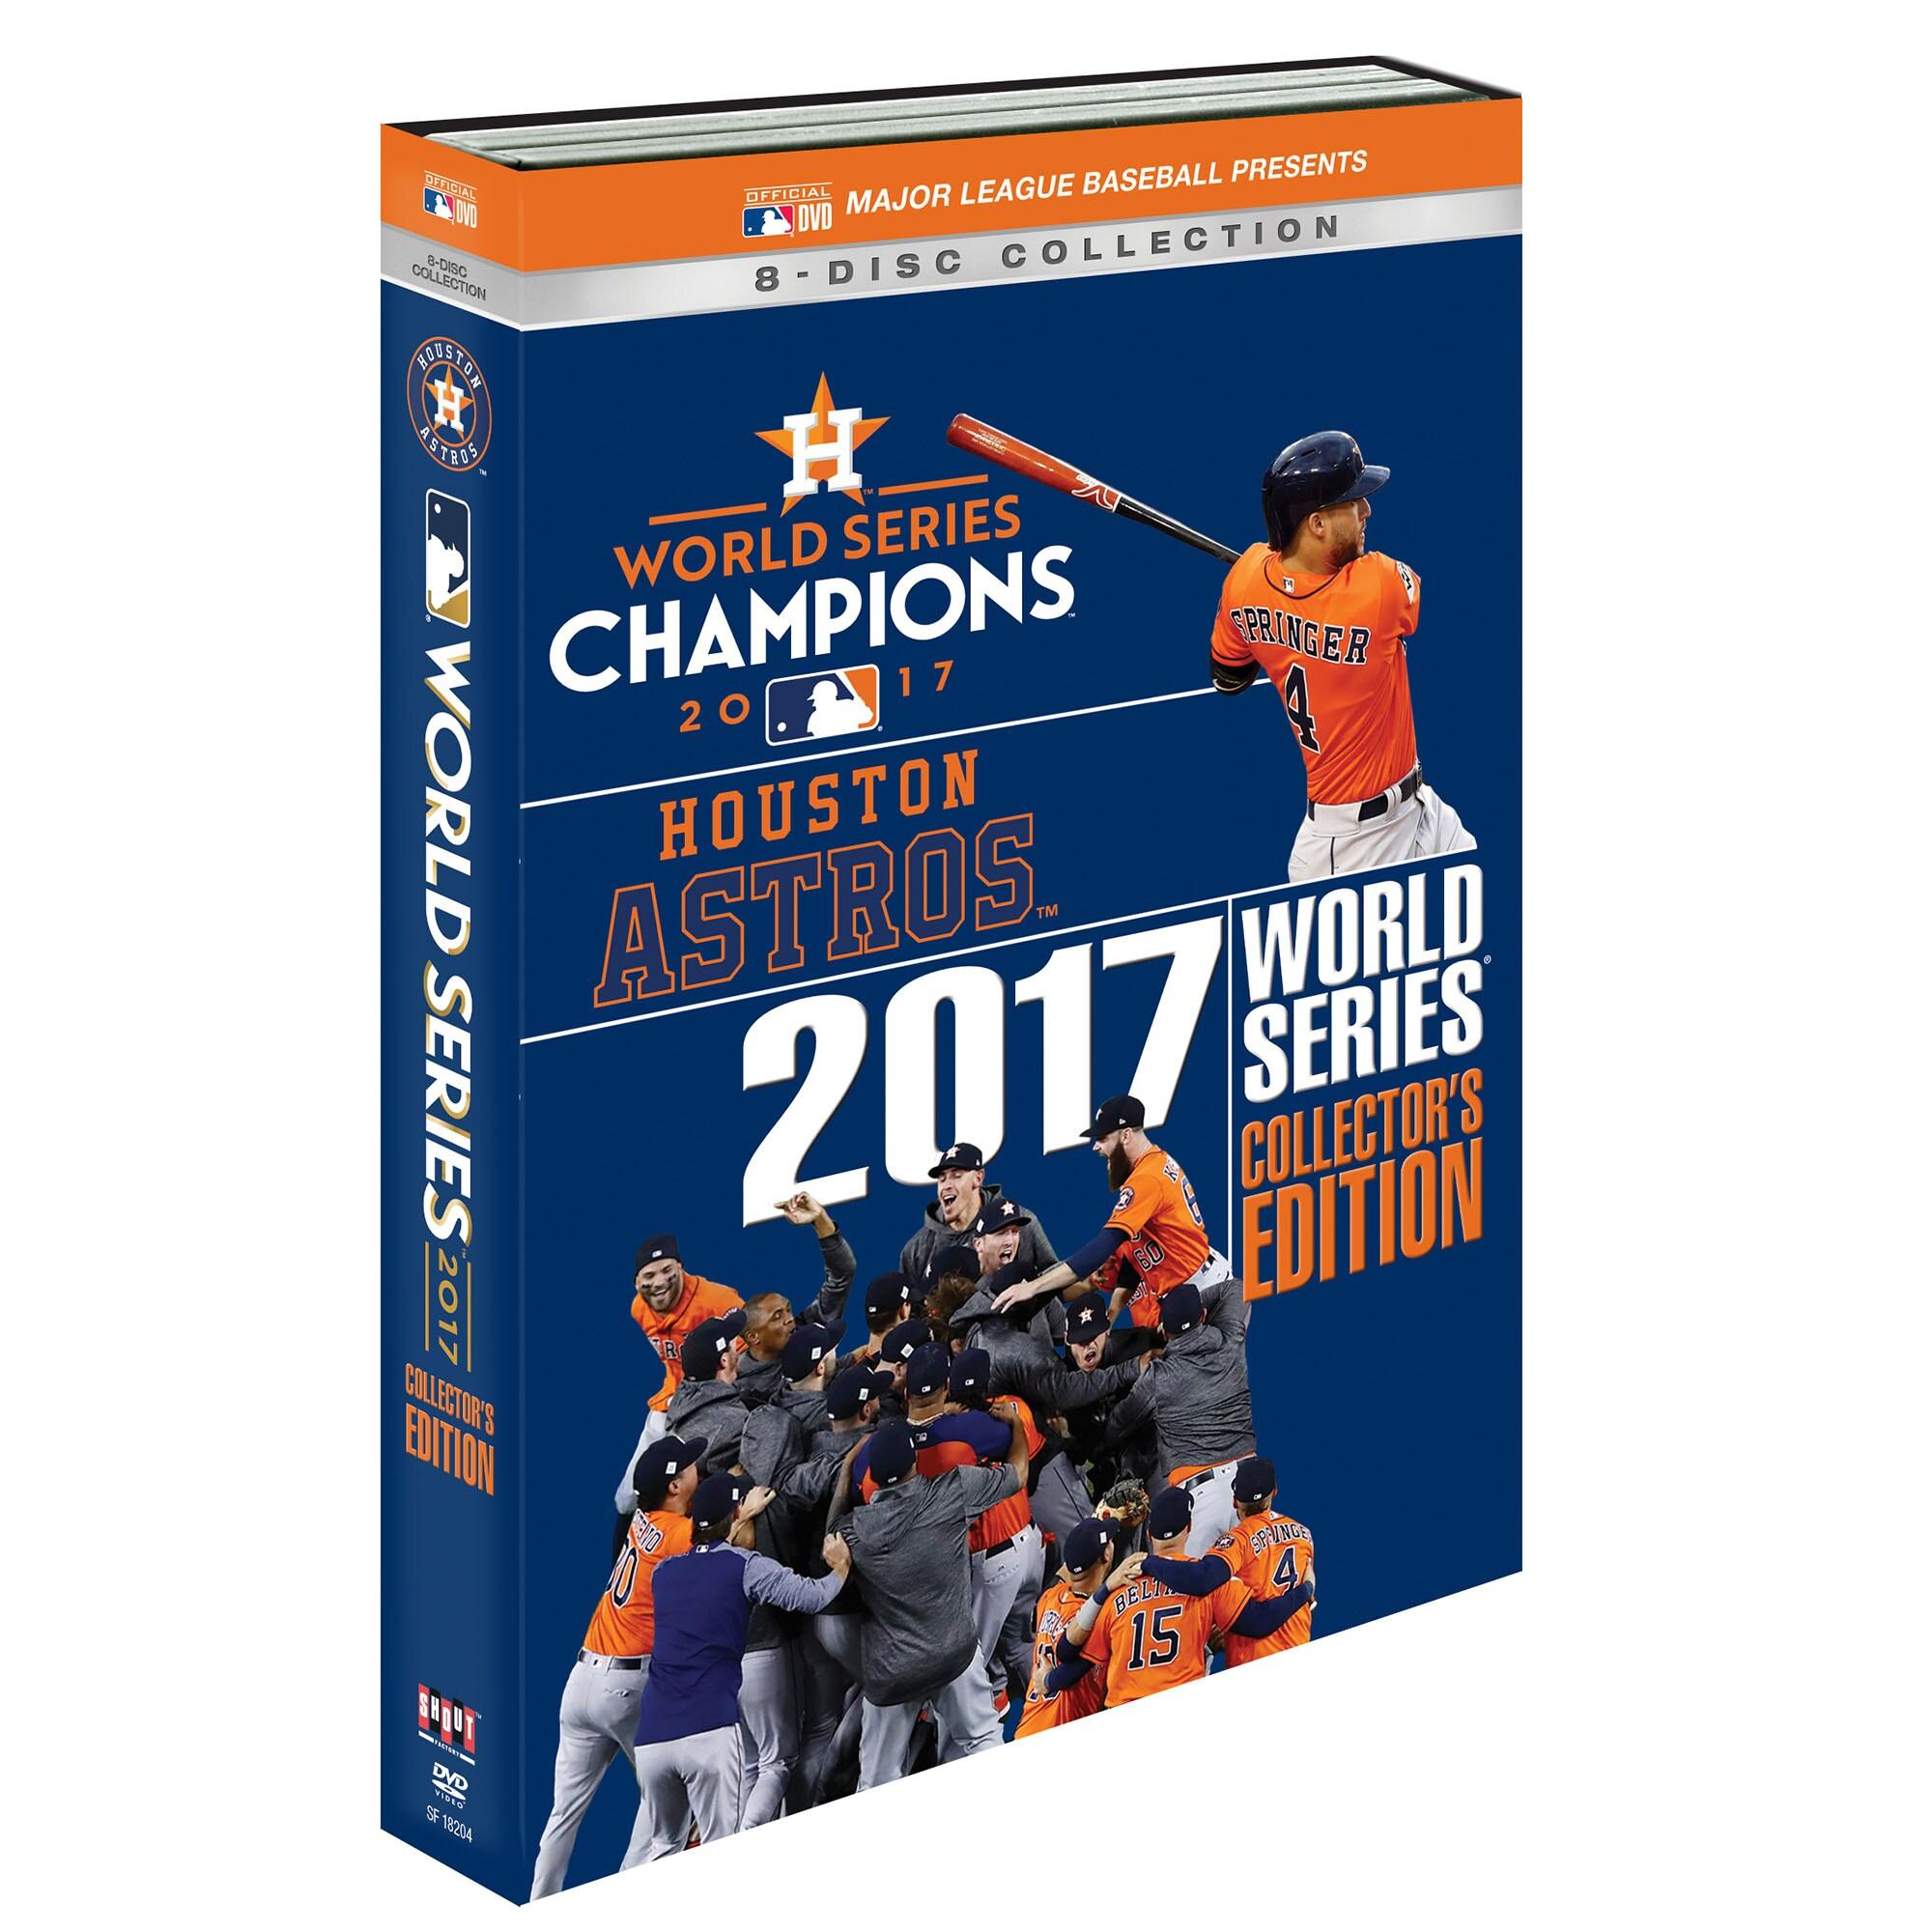 Houston Astros 2017 World Series Champions DVD Collector Set